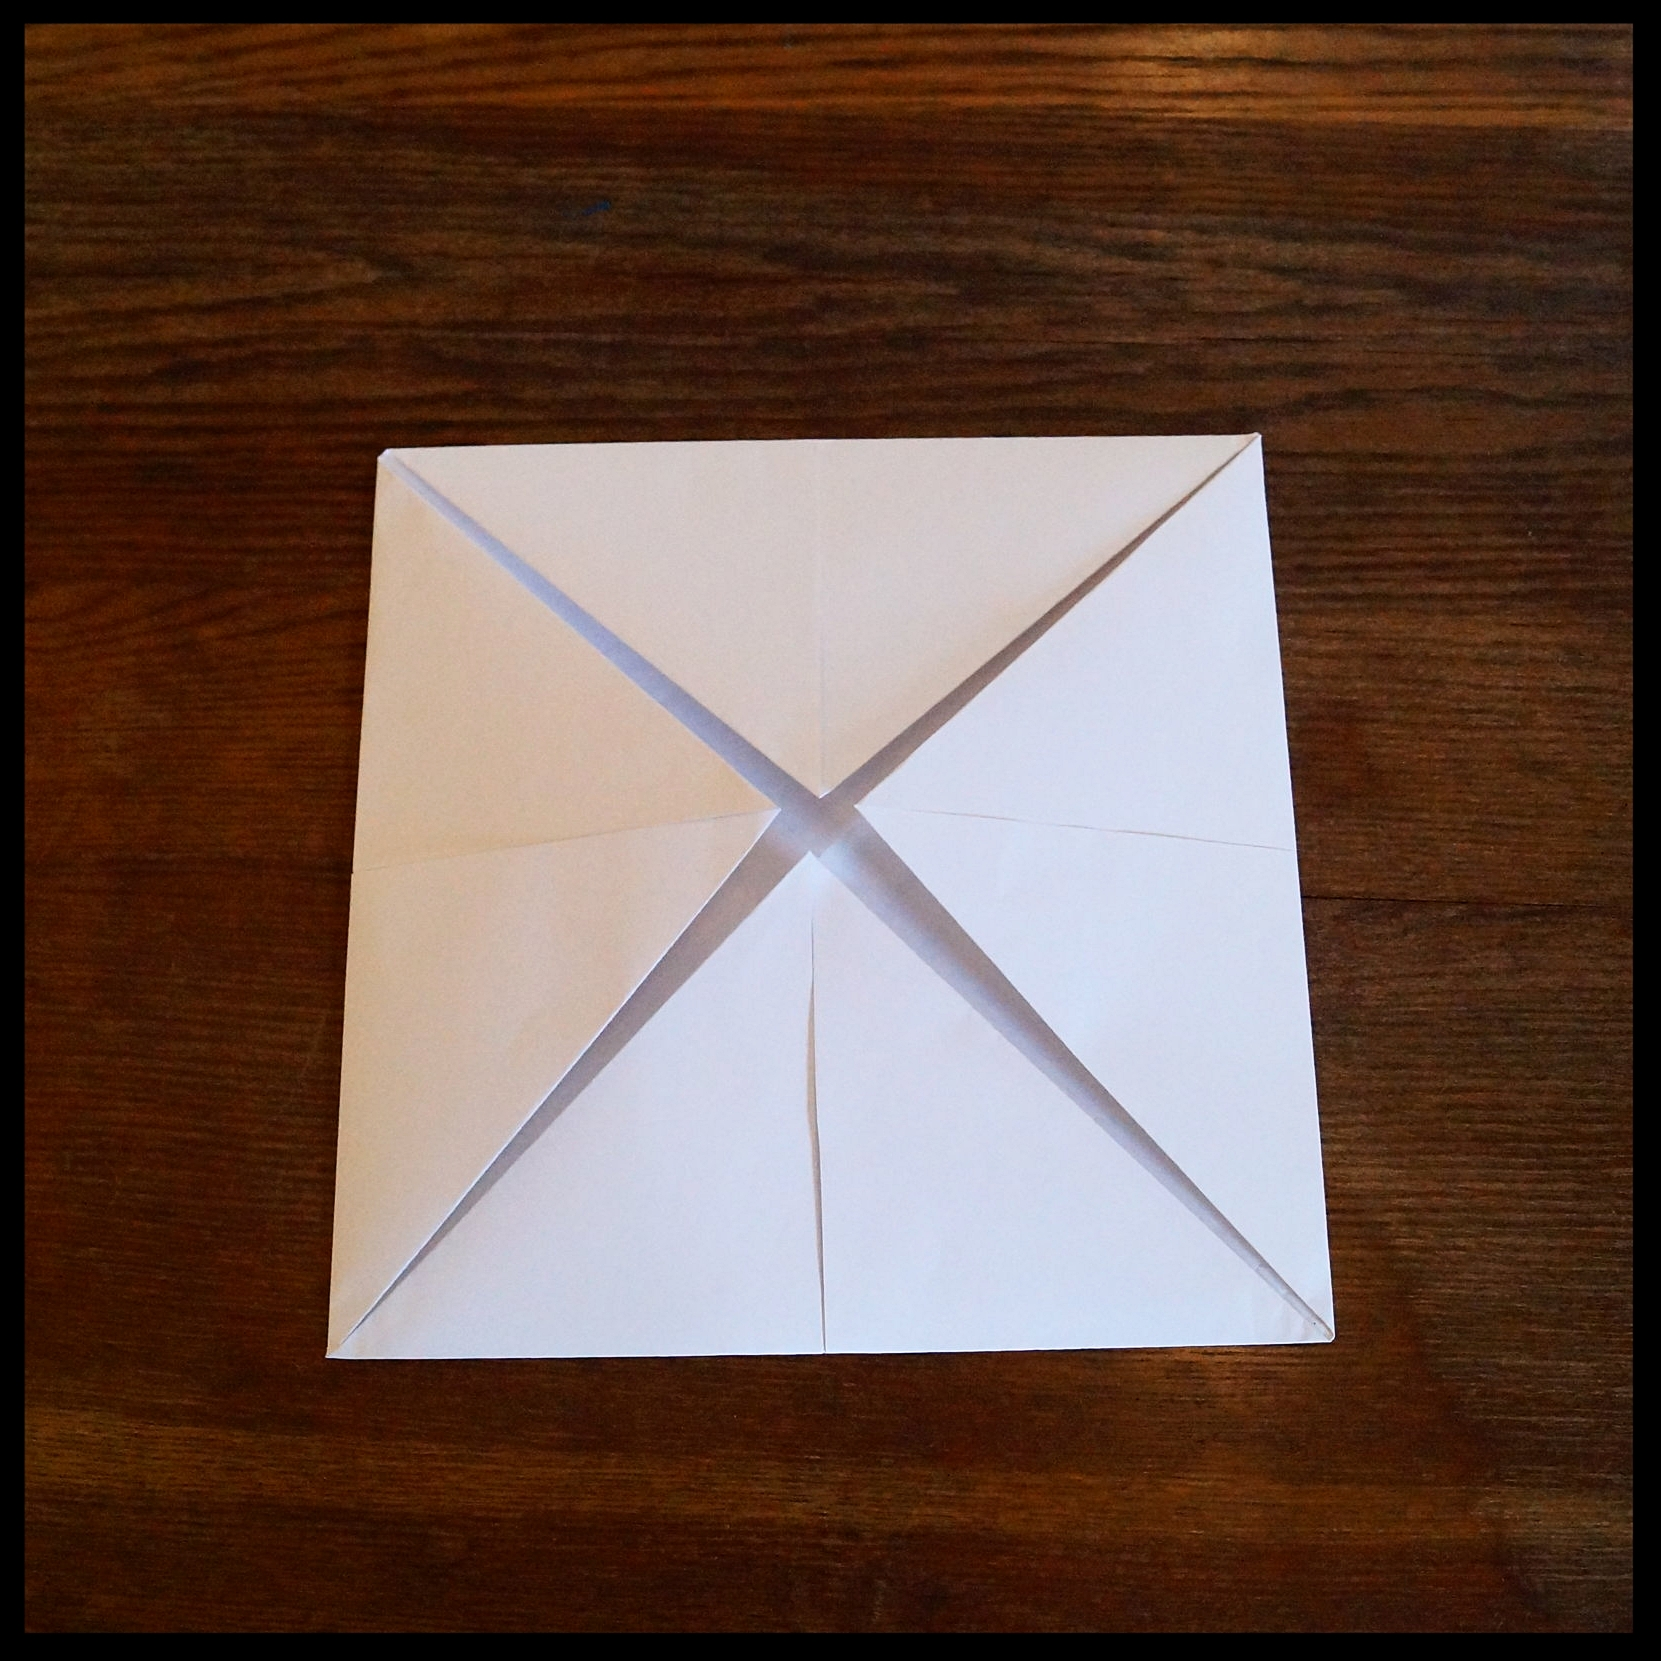 1c. Flip over. Fold each corner into the center again.